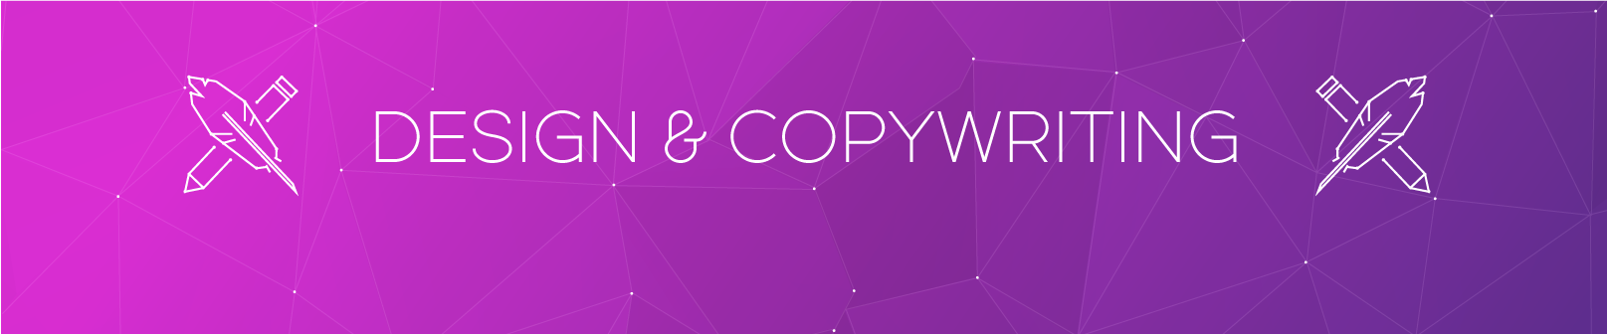 Banner-Content-Design-Copywriting-Dublin.png